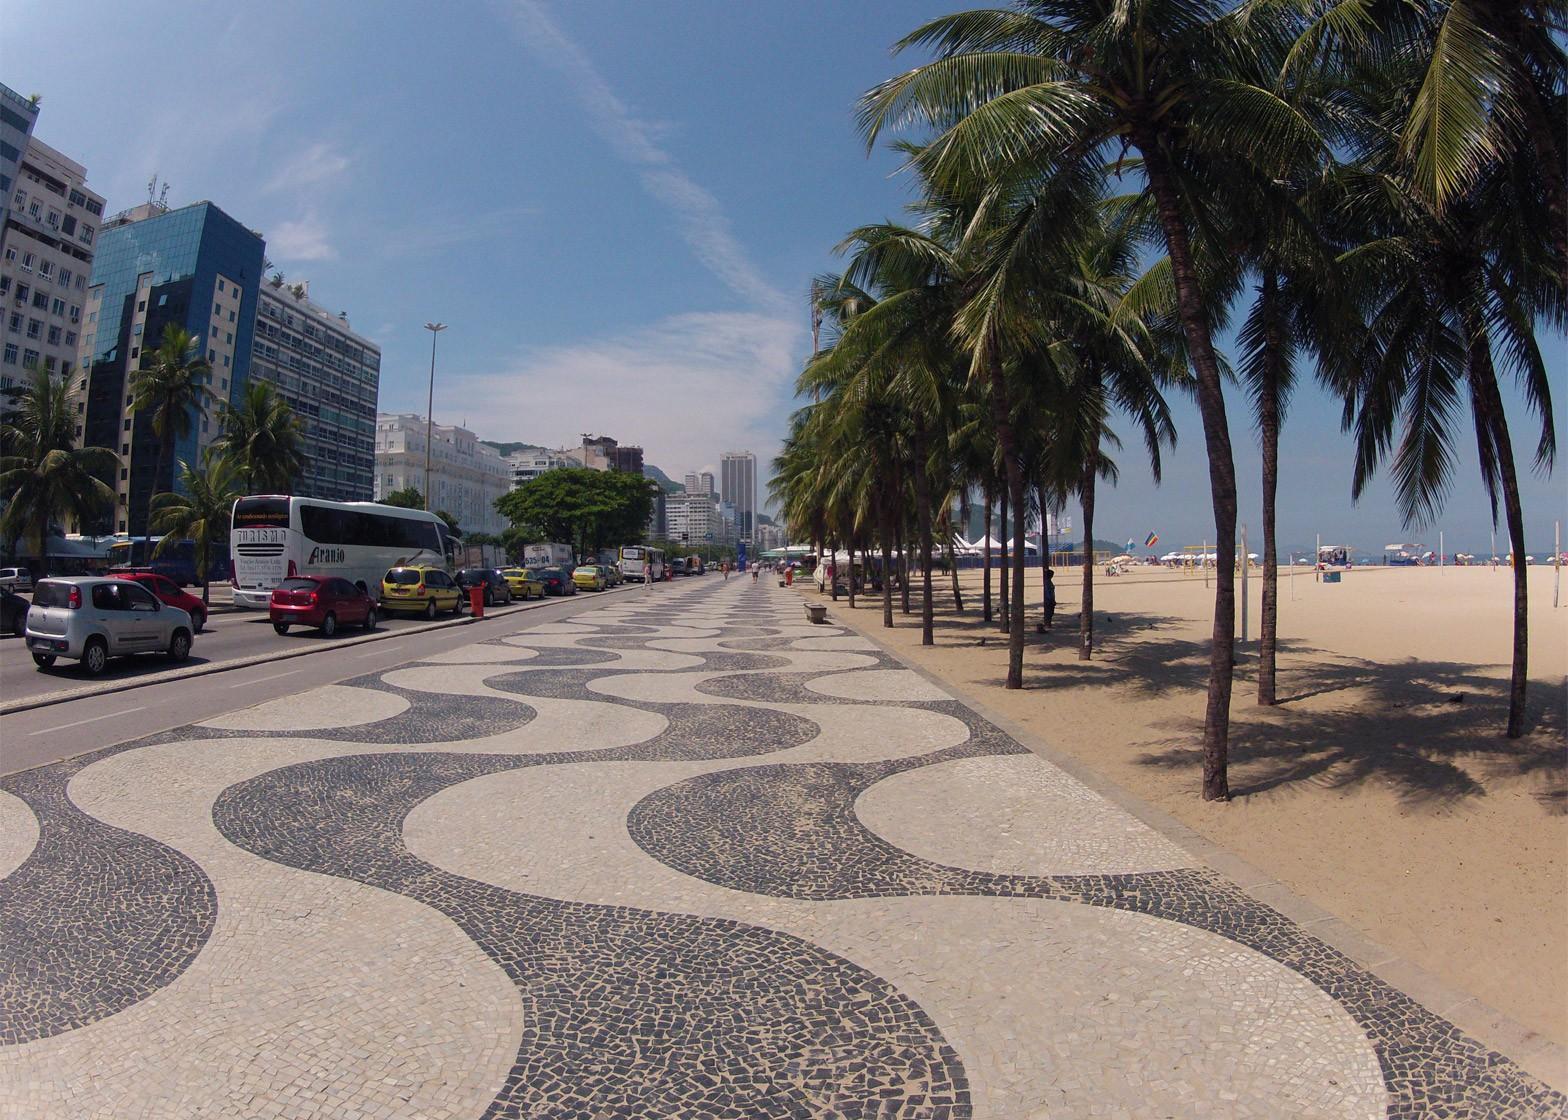 Copacabana Beach promenade by Roberto Burle Marx, 1970